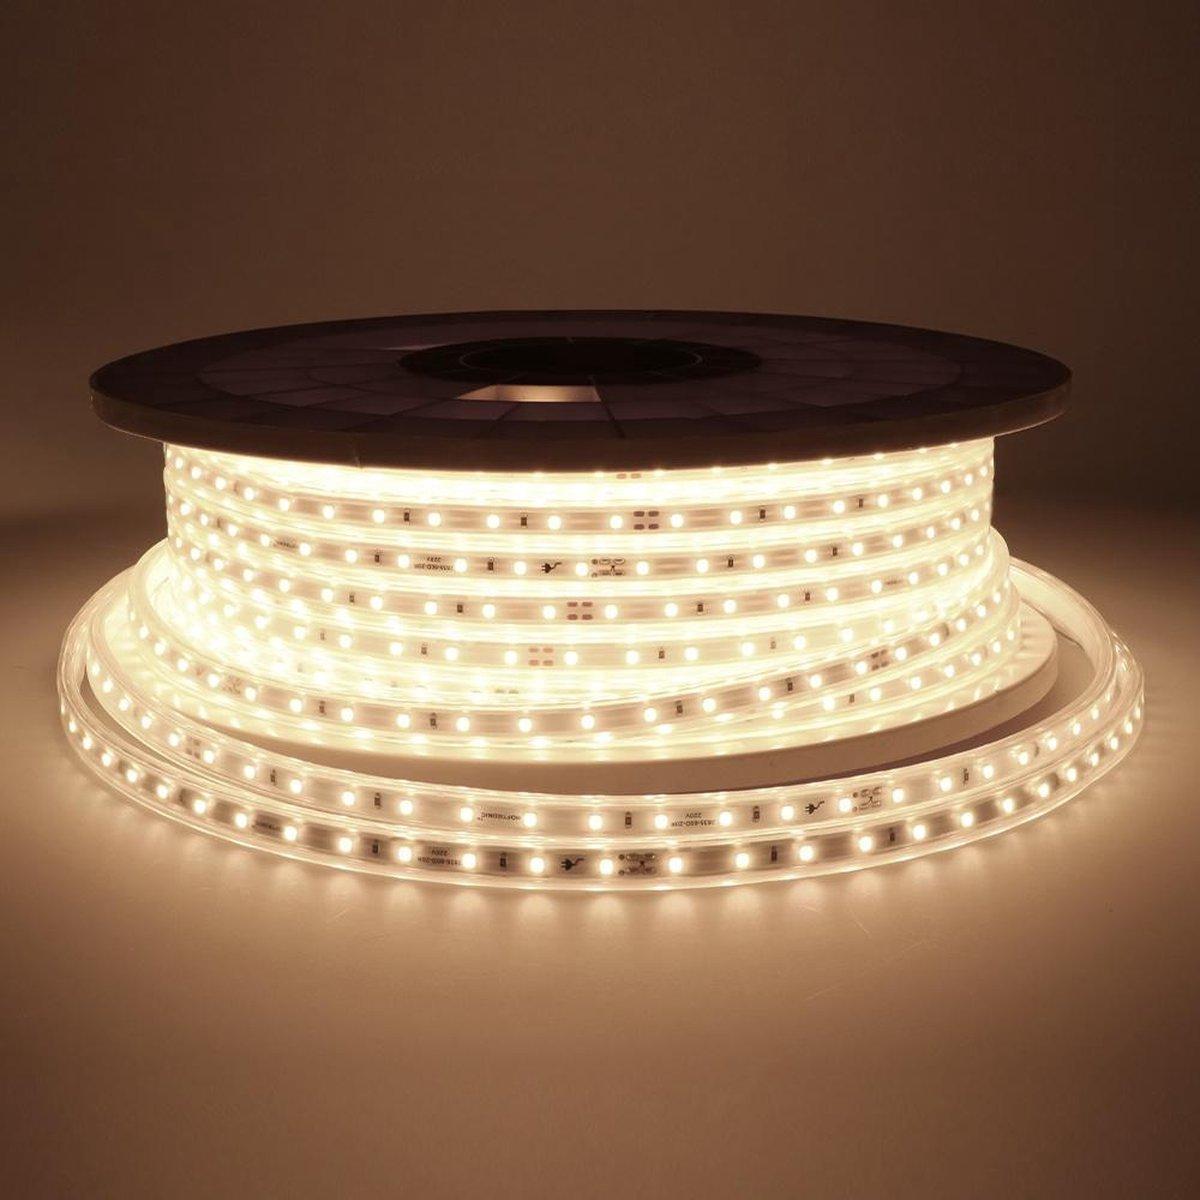 Dimbare LED Strip 50m 4000K 60 LEDs/m IP65 Plug & Play - Flex60 Series